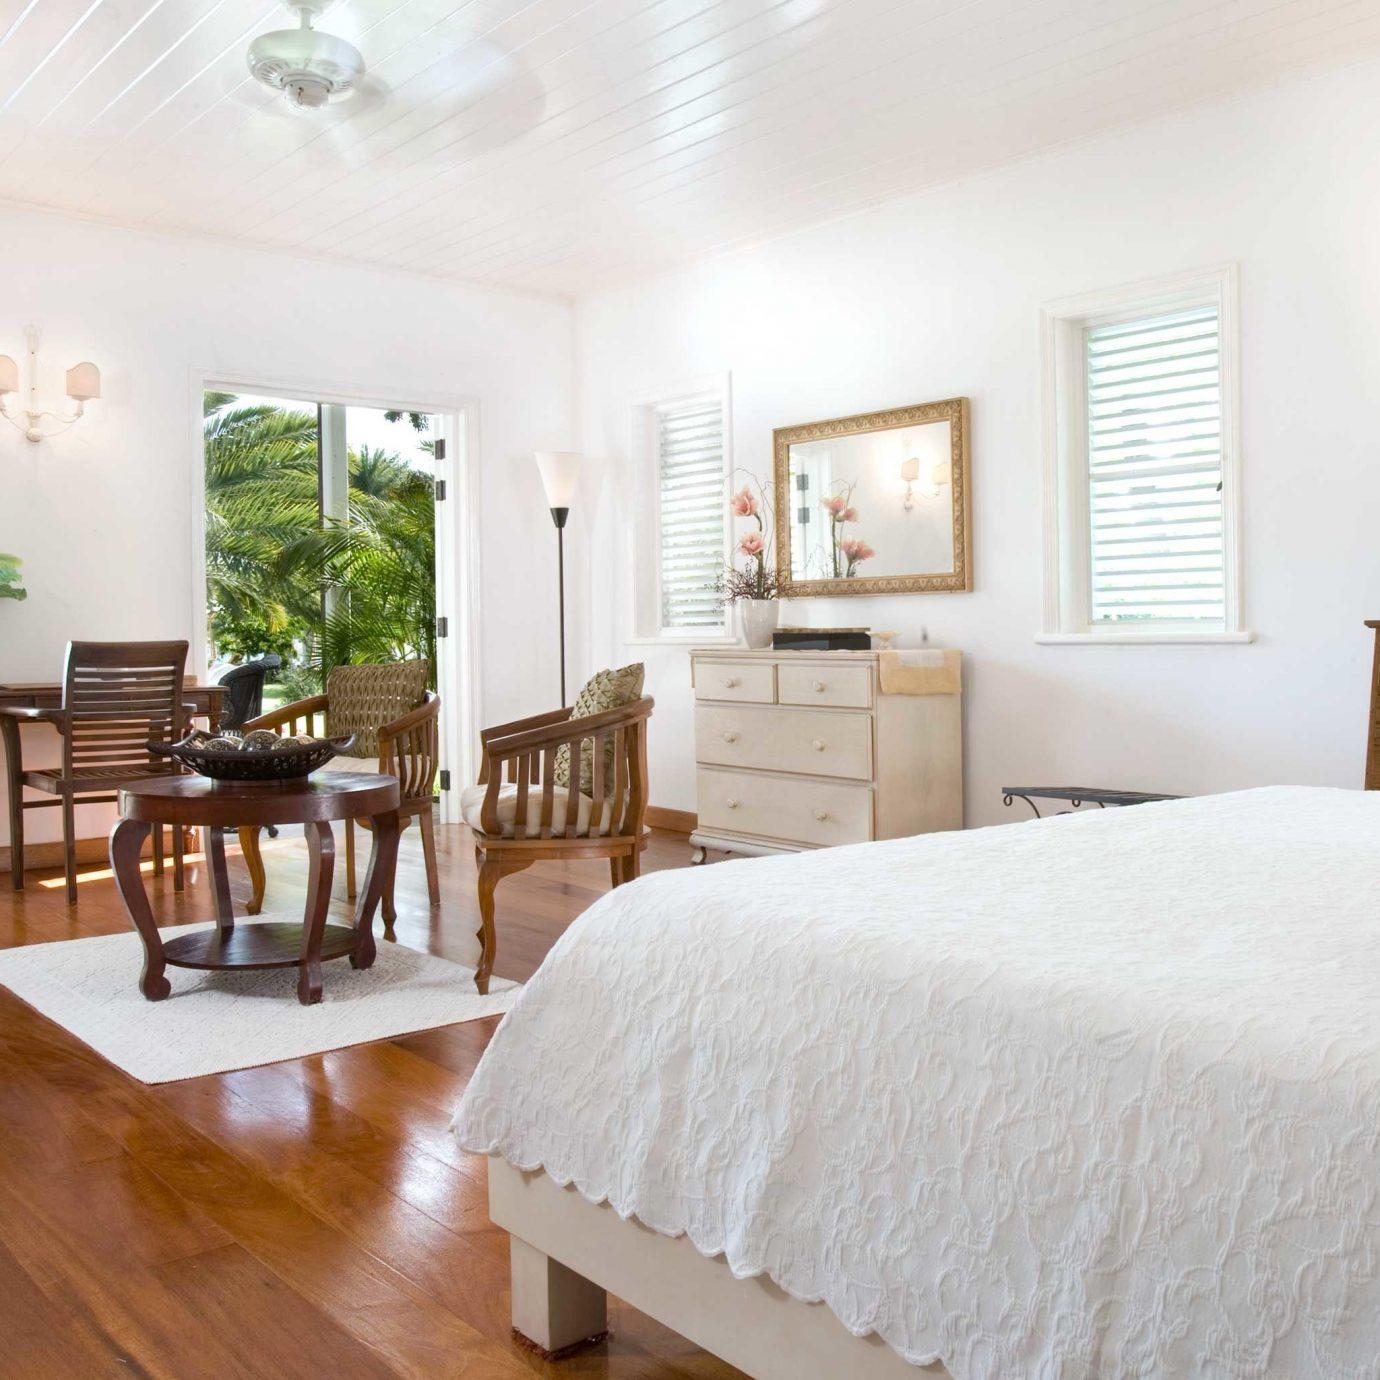 Bedroom Classic Inn property home hardwood Villa cottage Resort living room wood flooring farmhouse mansion Suite nice